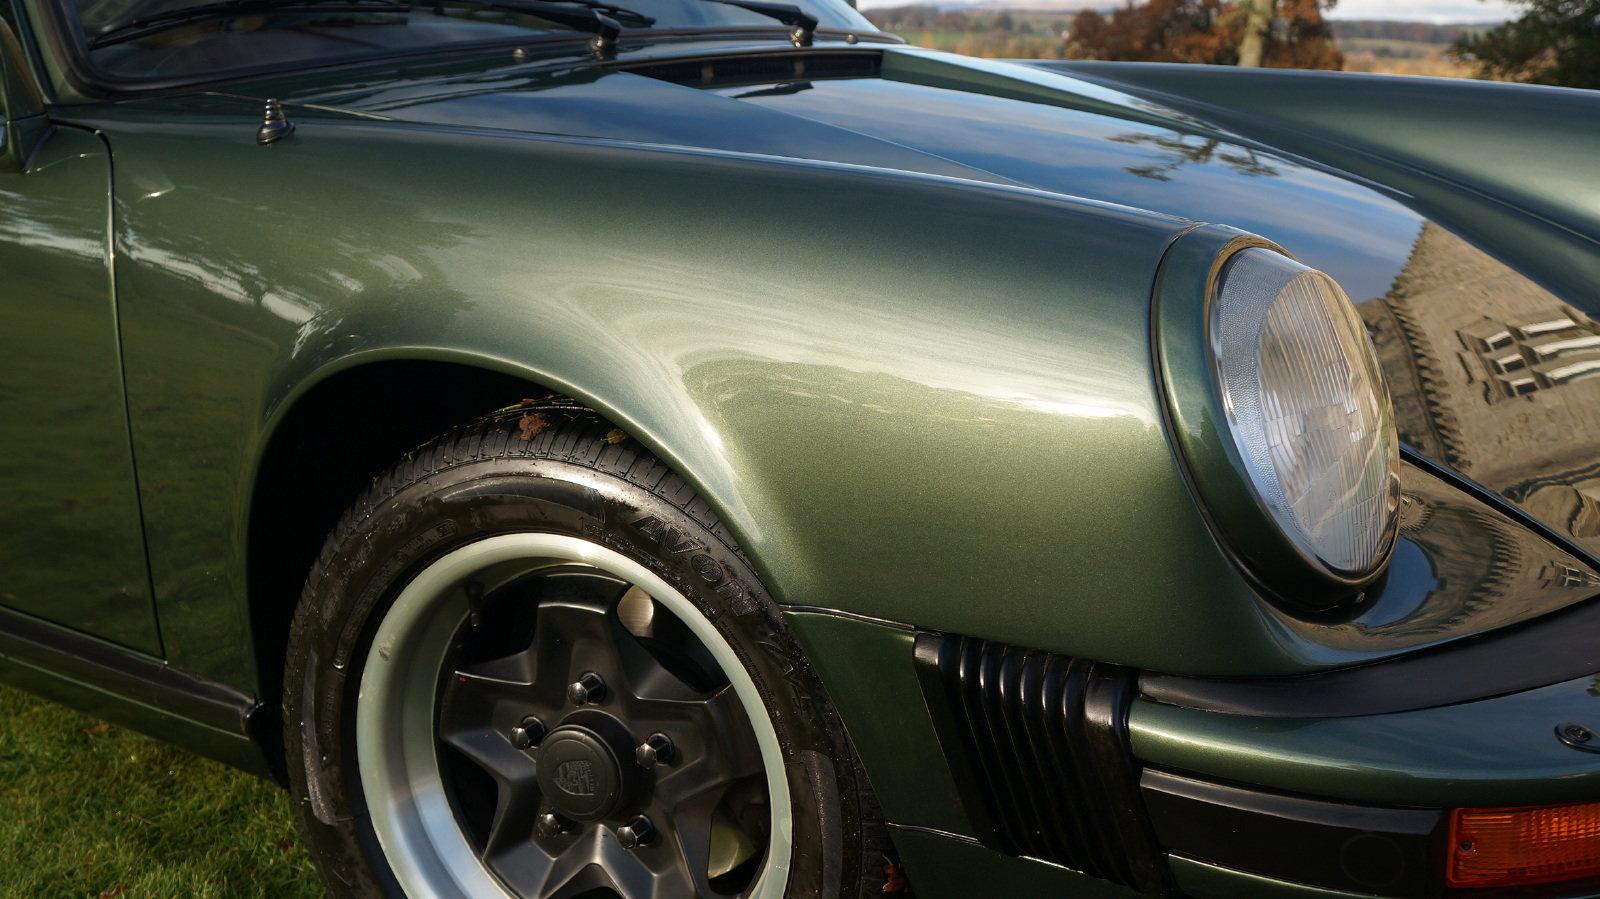 1979 Porsche 911 SC Oak Green Coupe For Sale (picture 6 of 6)